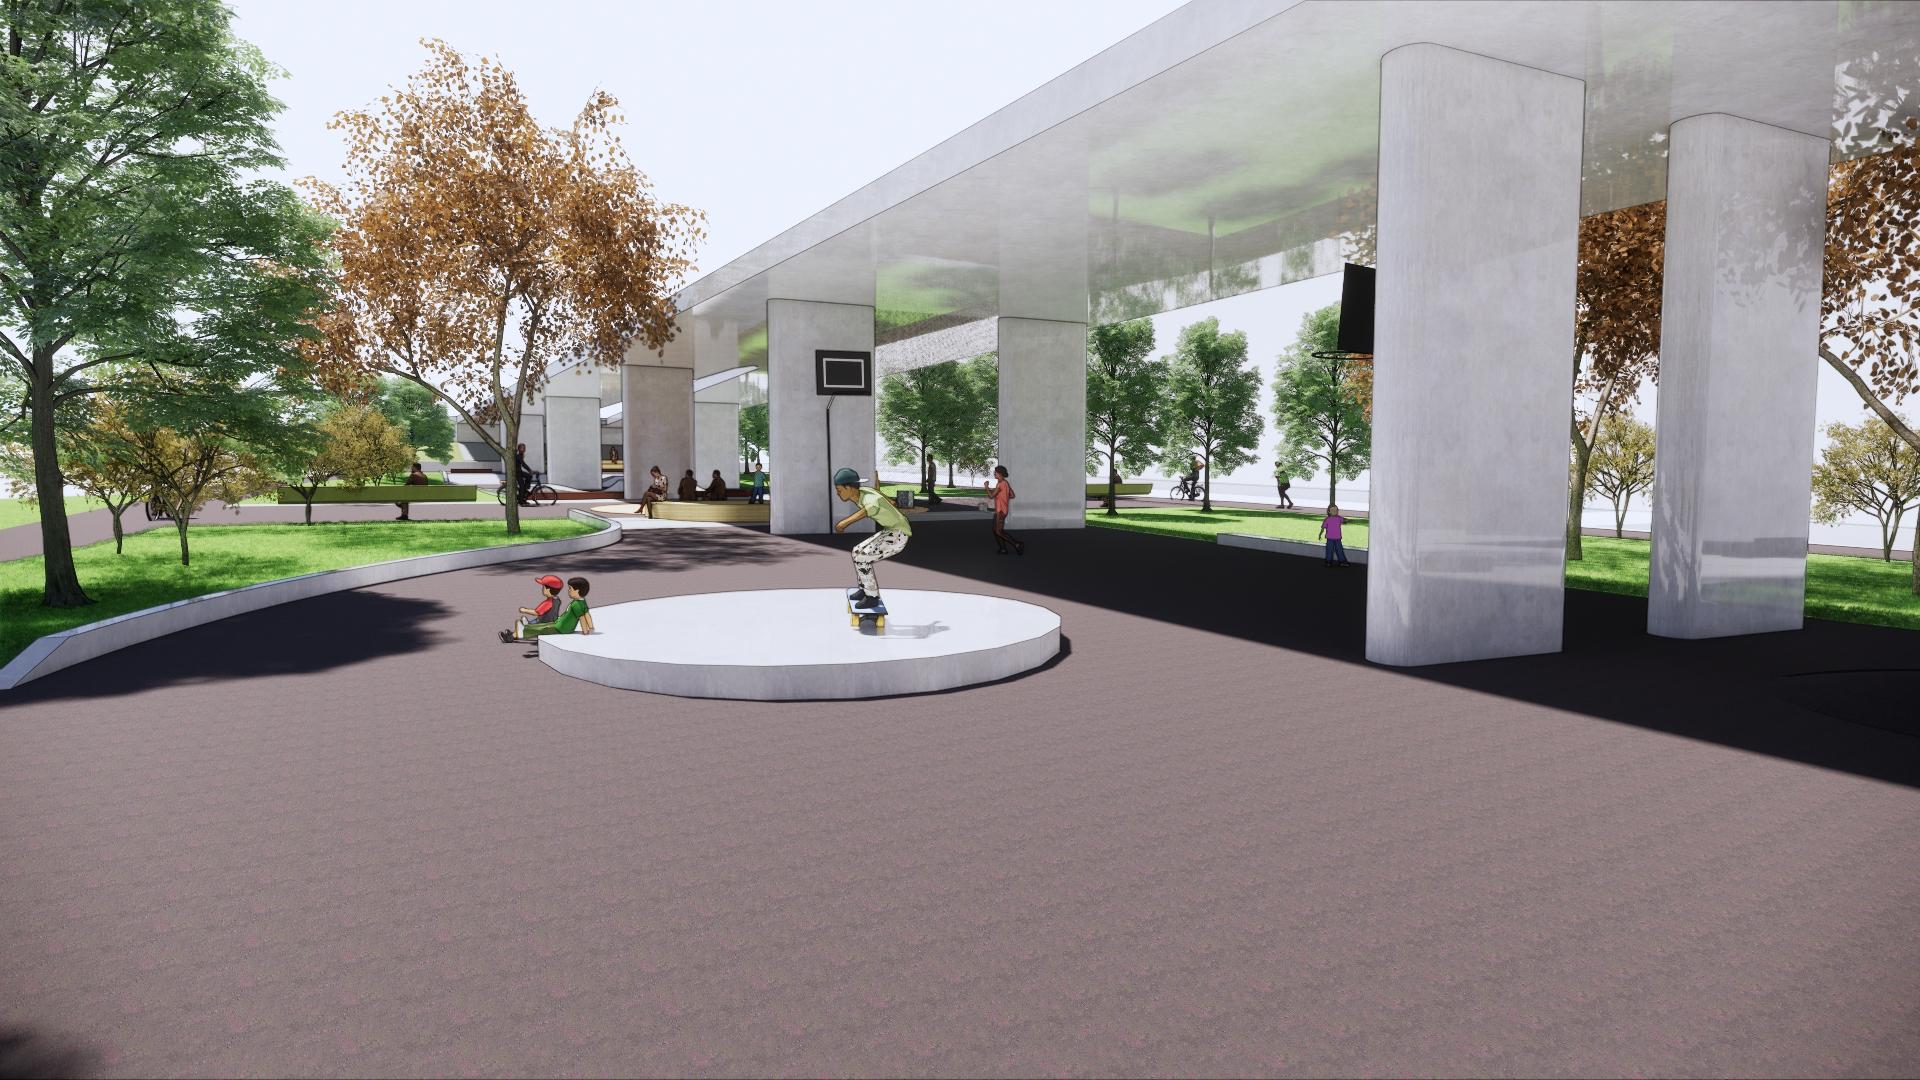 Visualisering rullparken under bron Teaterparken